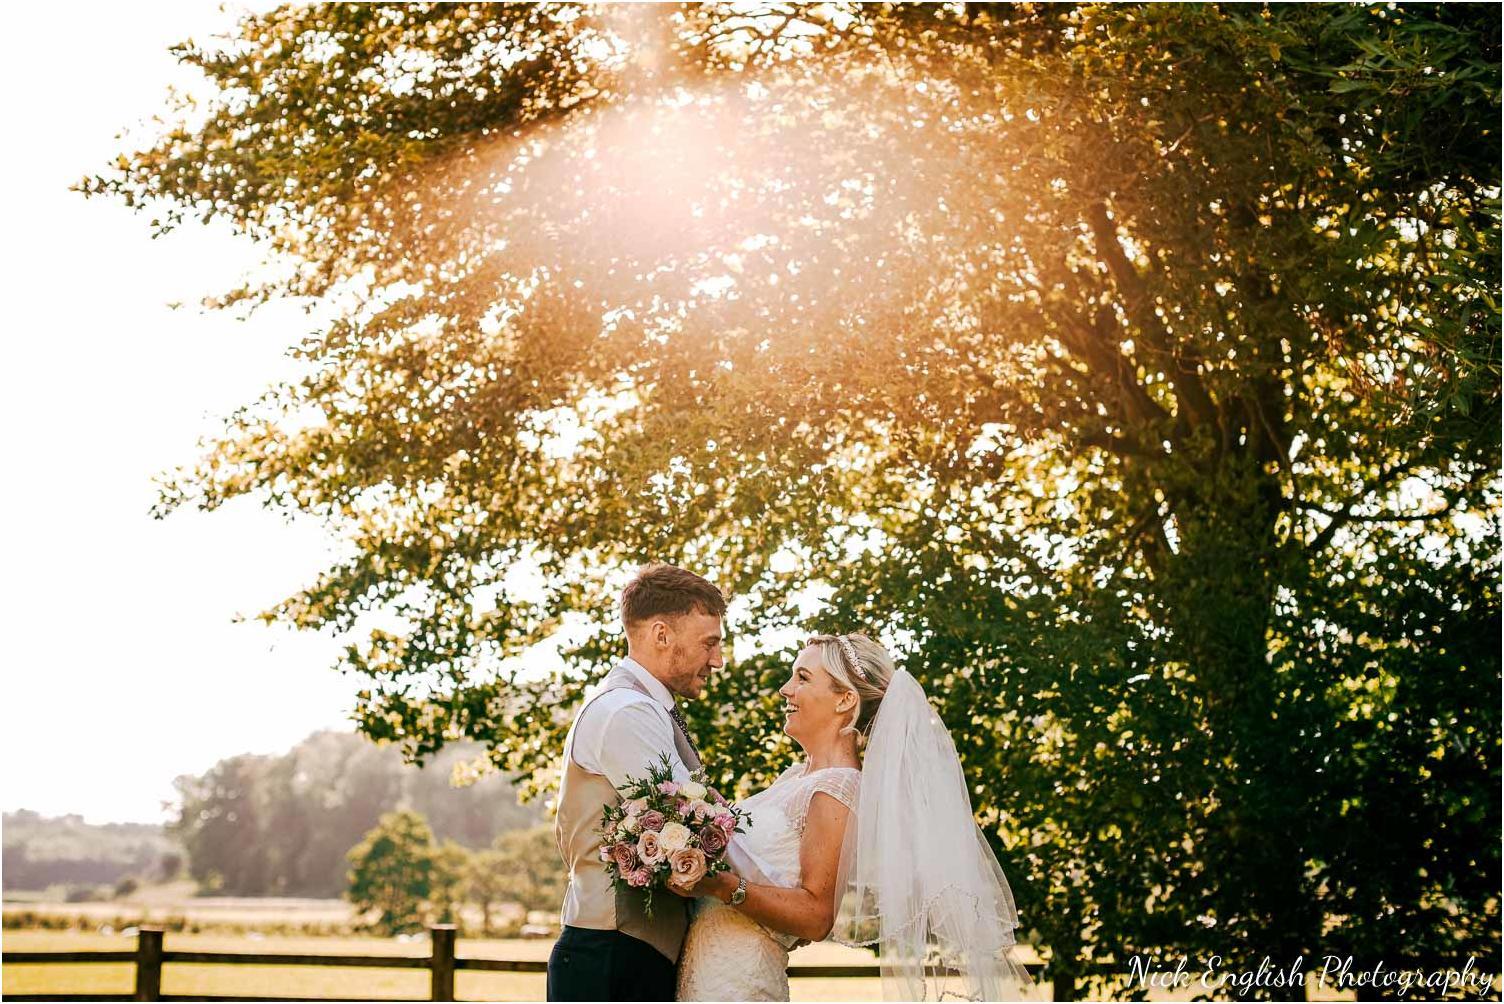 Mitton_Hall_Wedding_Photograph-142.jpg